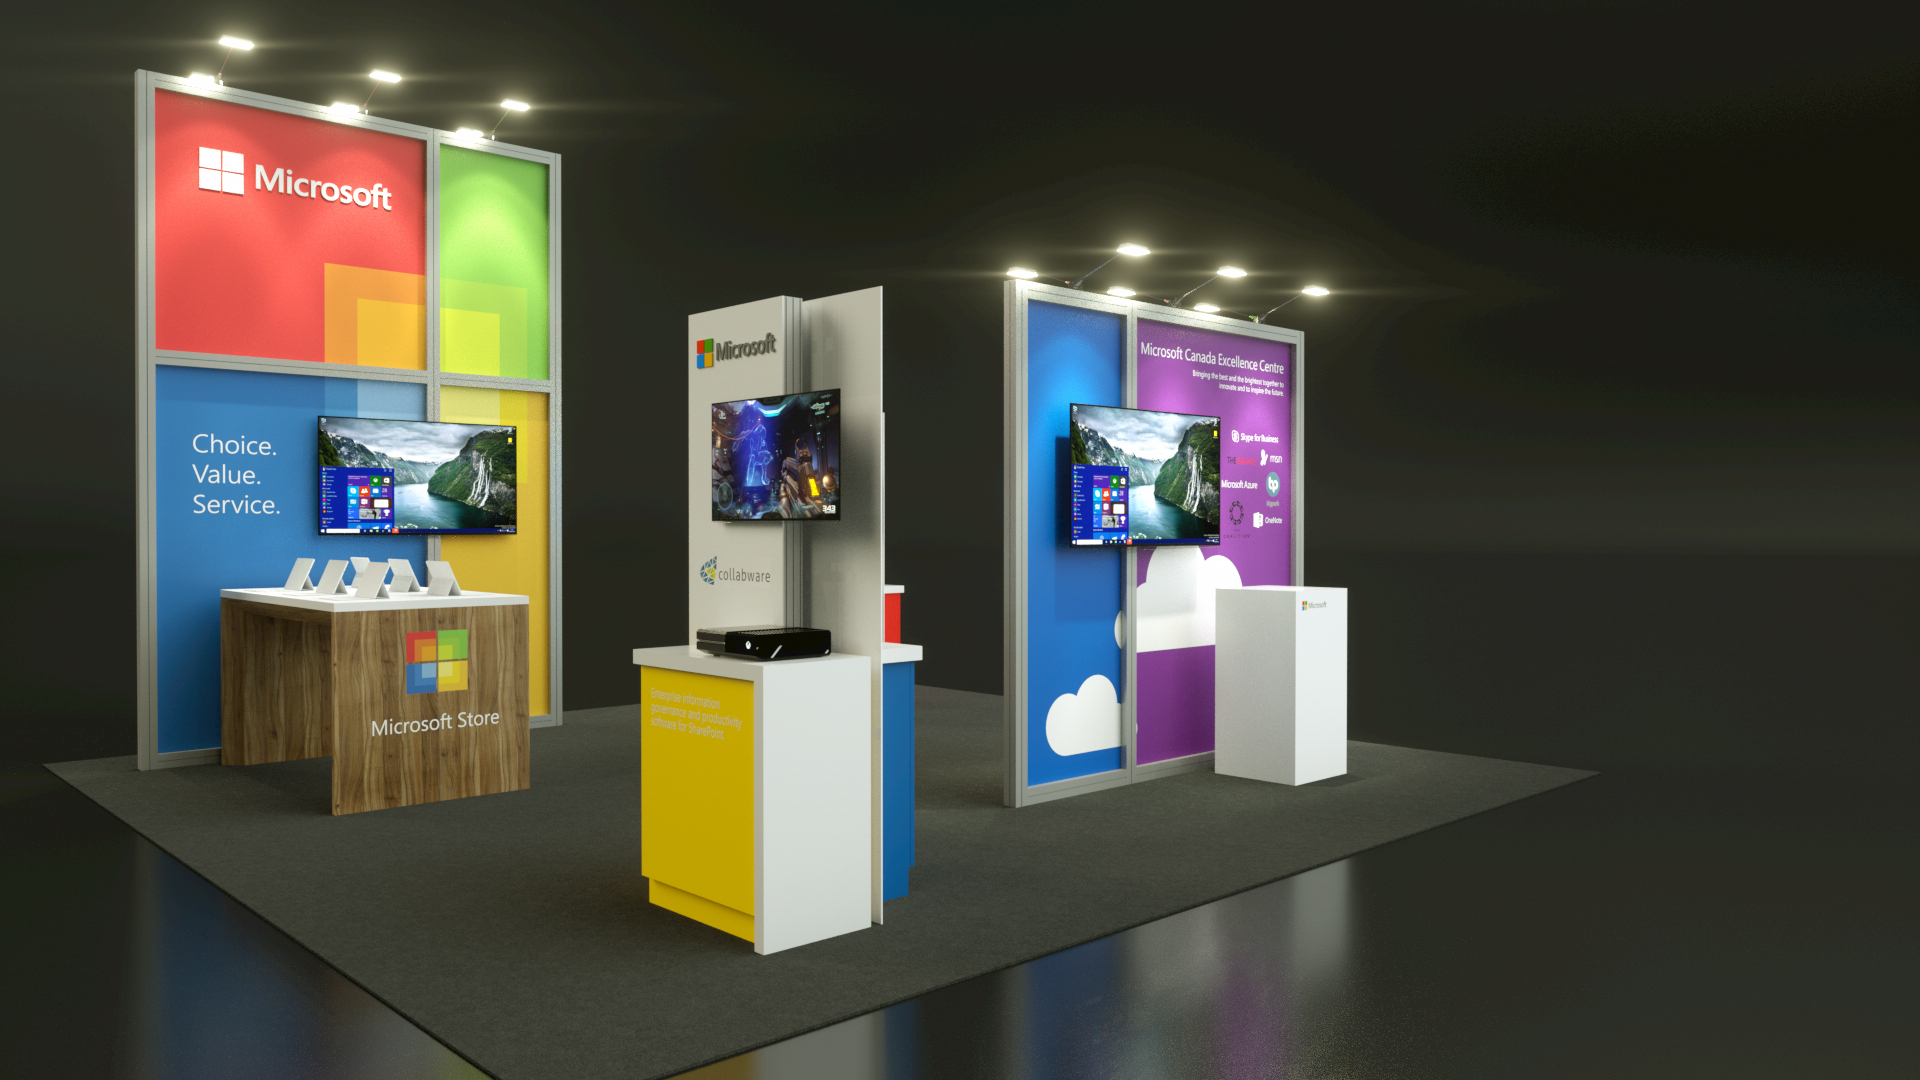 3038 - Microsoft - BC Tech Summit 2016 - View 1.jpg